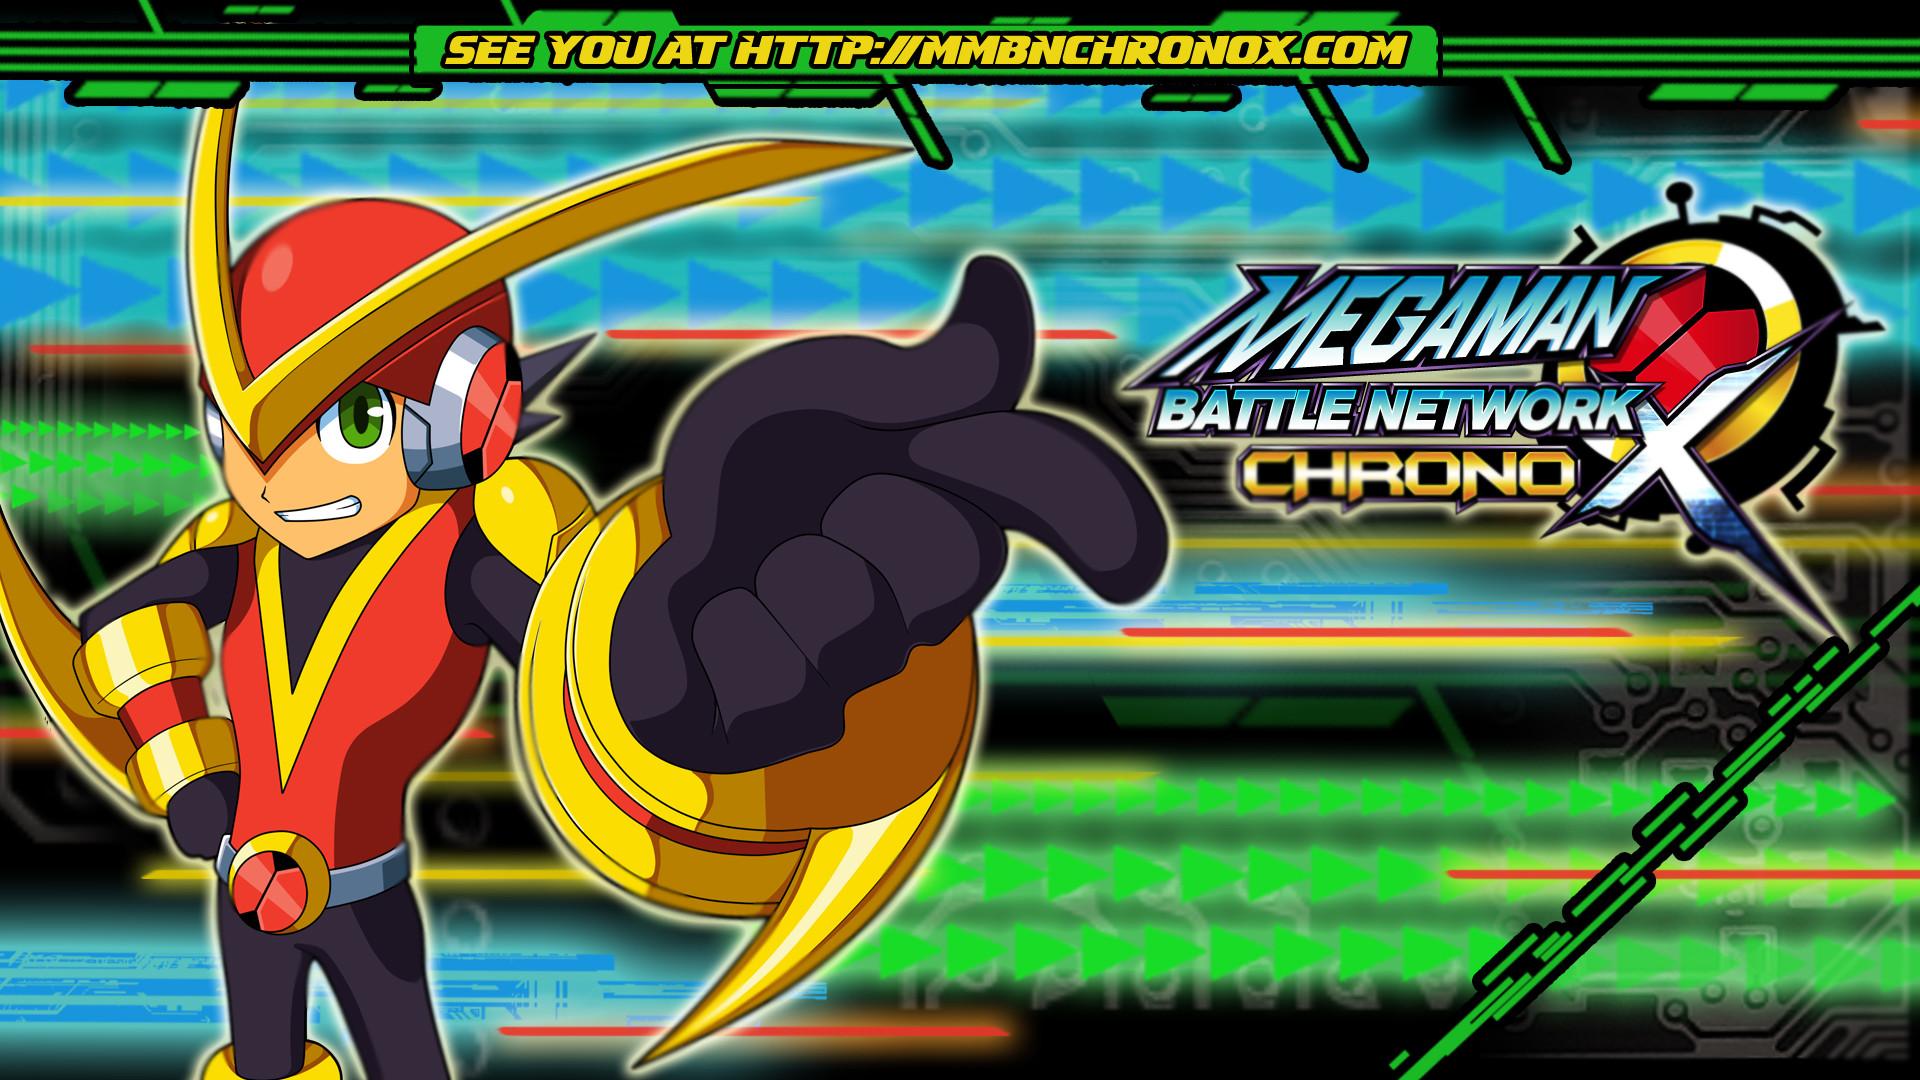 Megaman Battle Network Poster by balade on DeviantArt